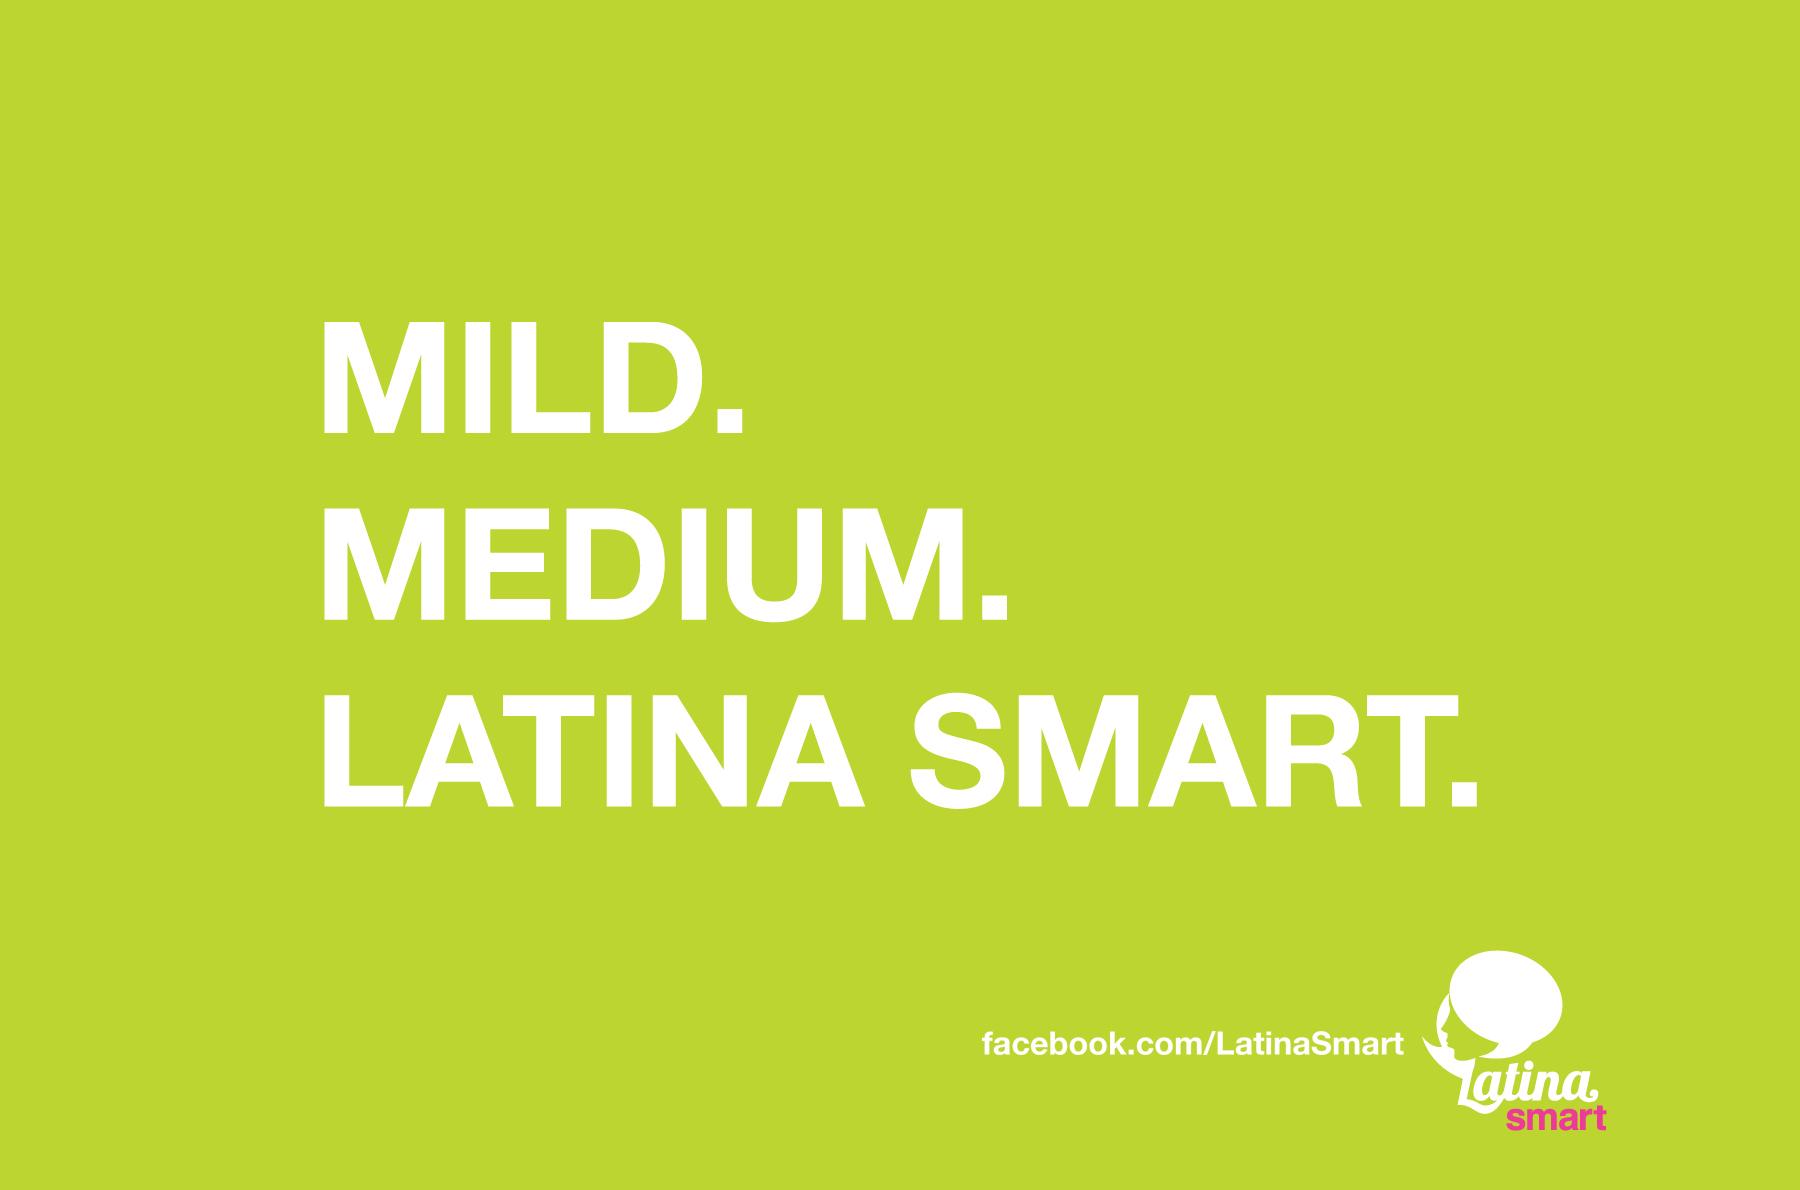 latina mild